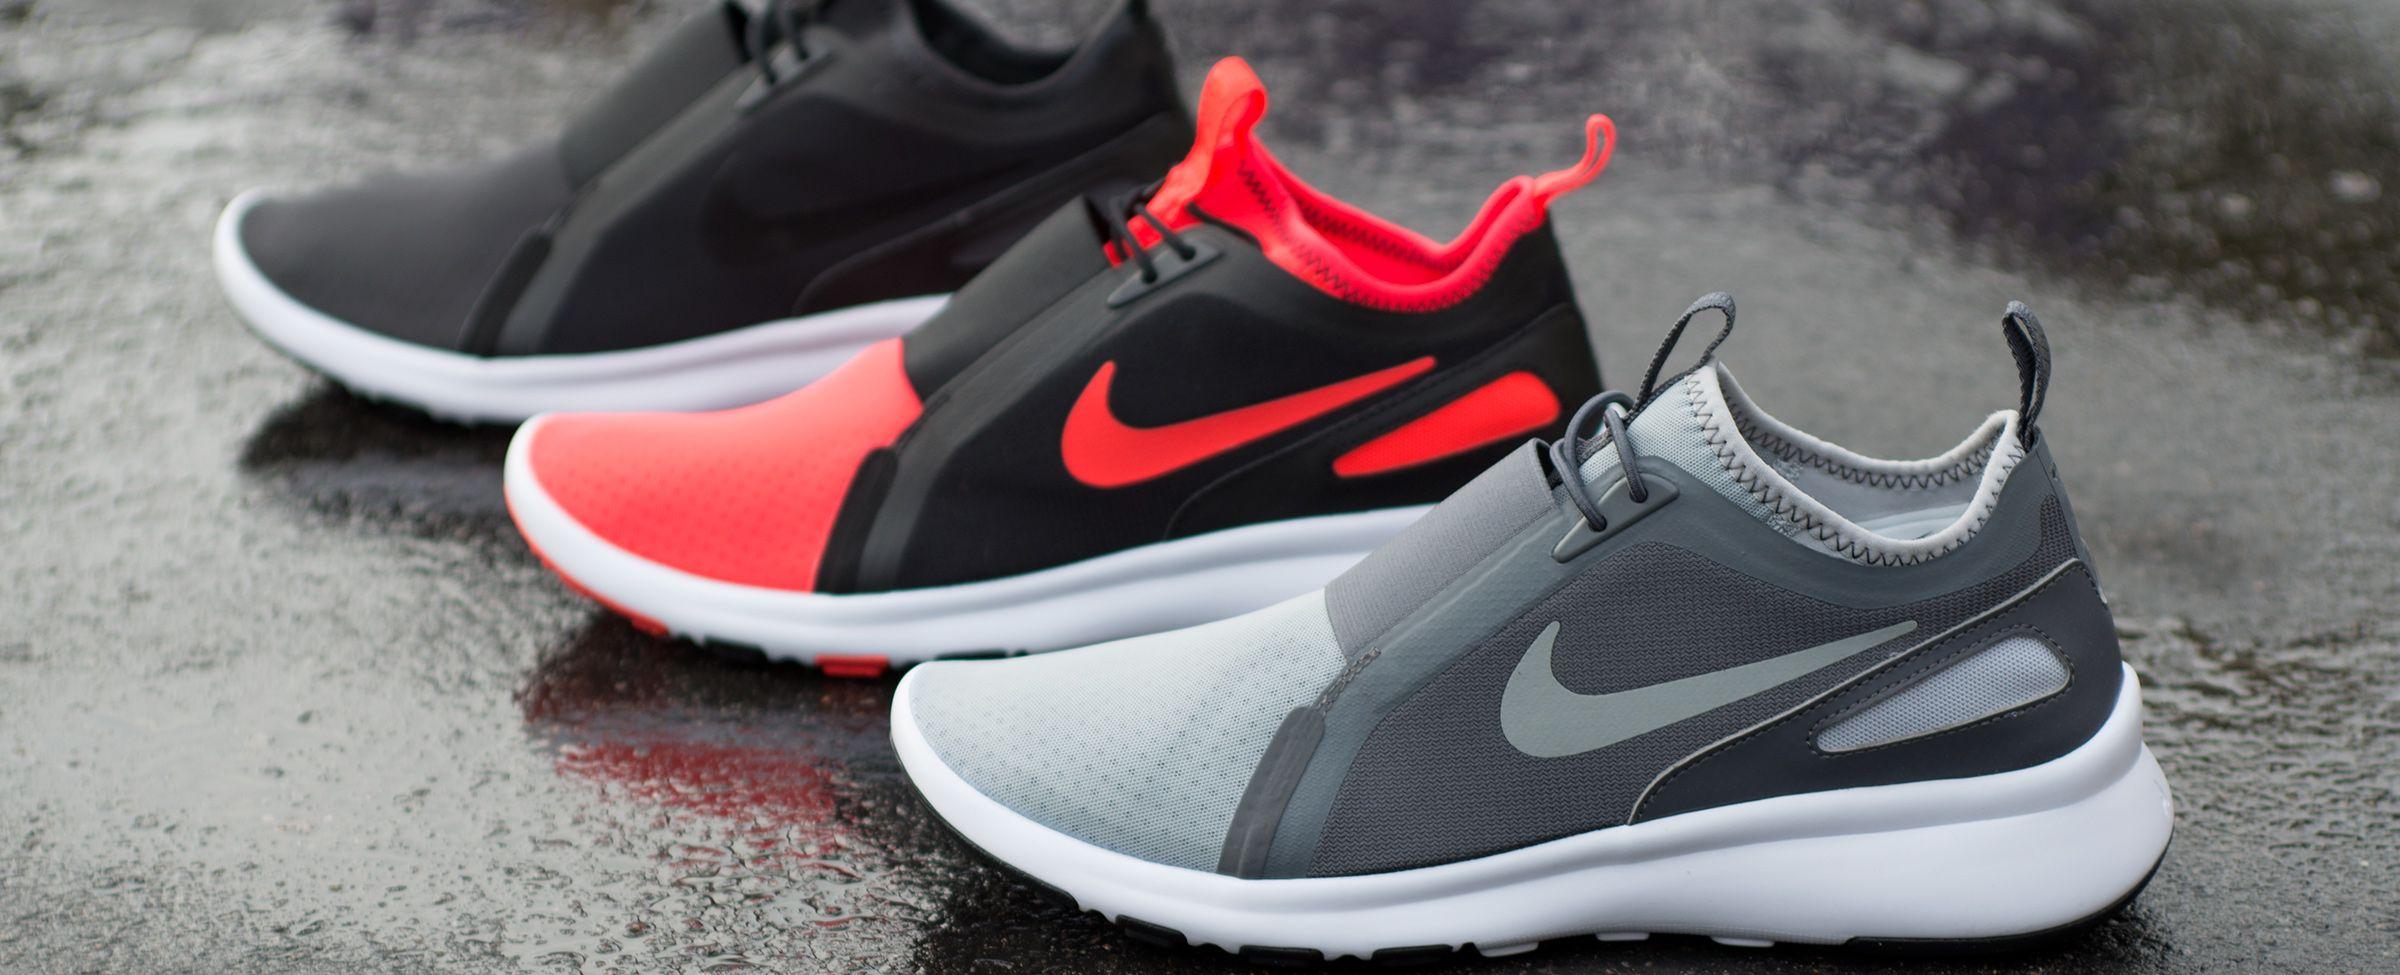 Nike Current Slip-On | Online sneaker